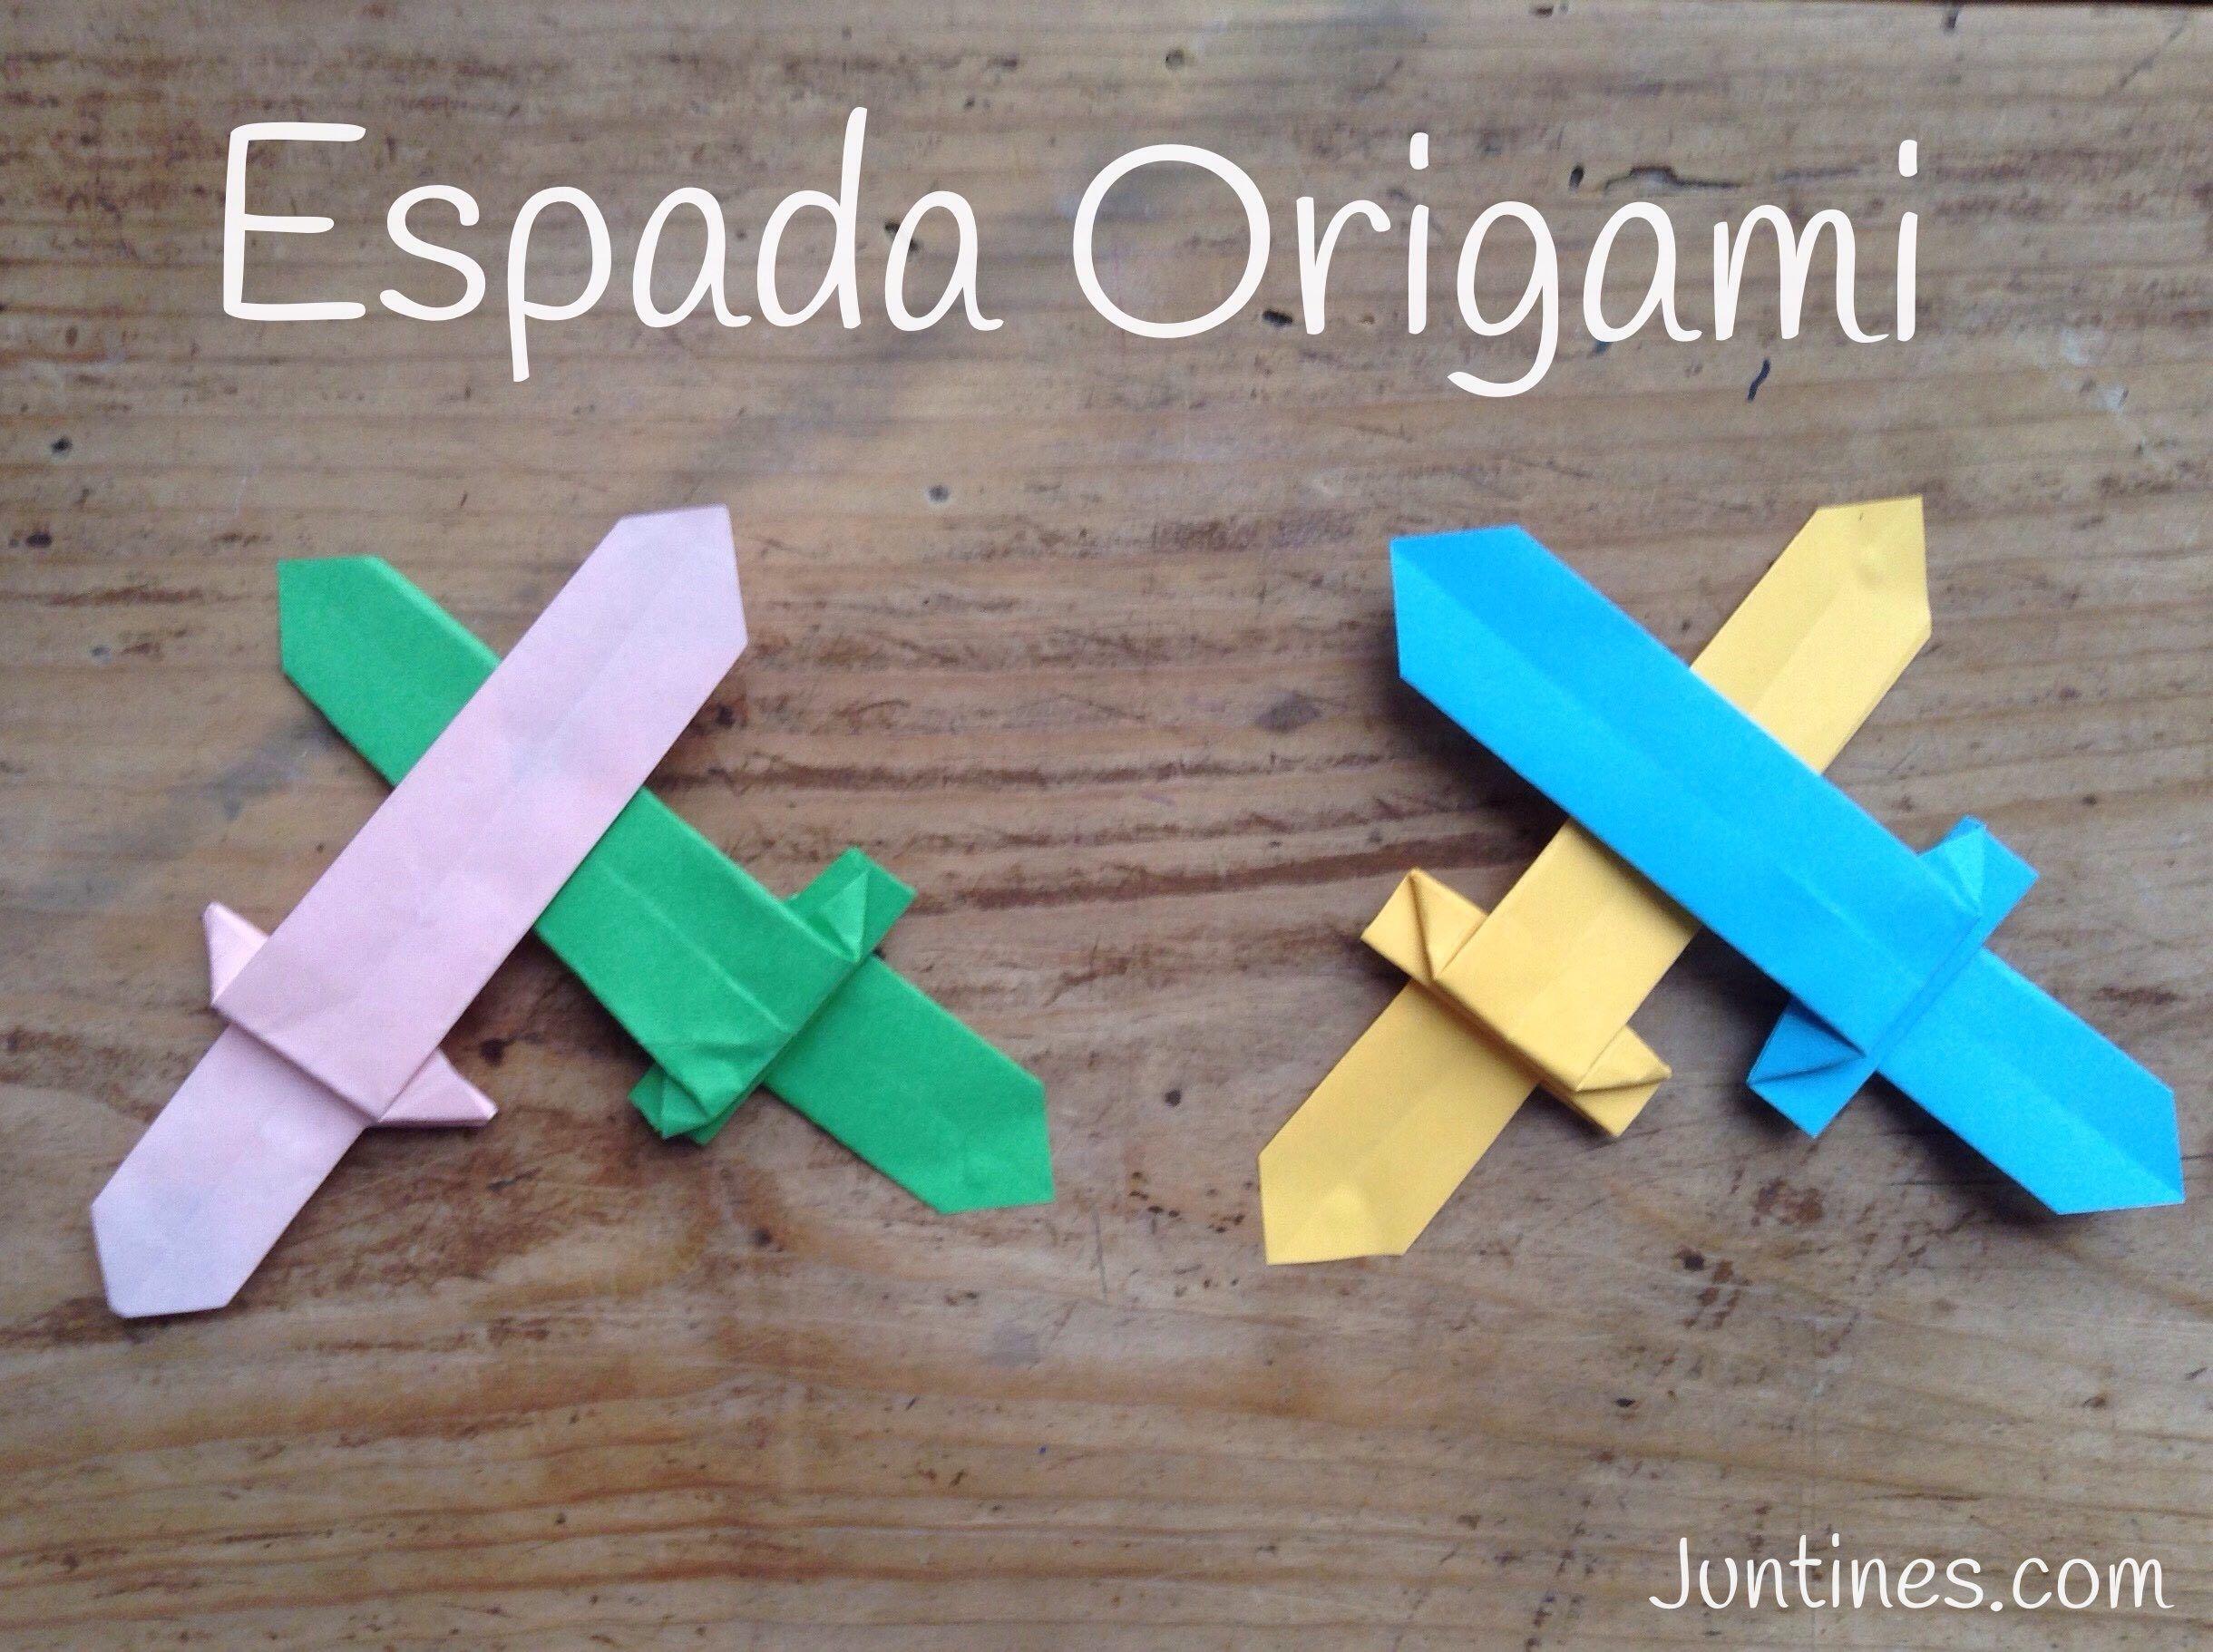 Espada de origami origami sword manualidades de papel - Papiroflexia paso a paso ...